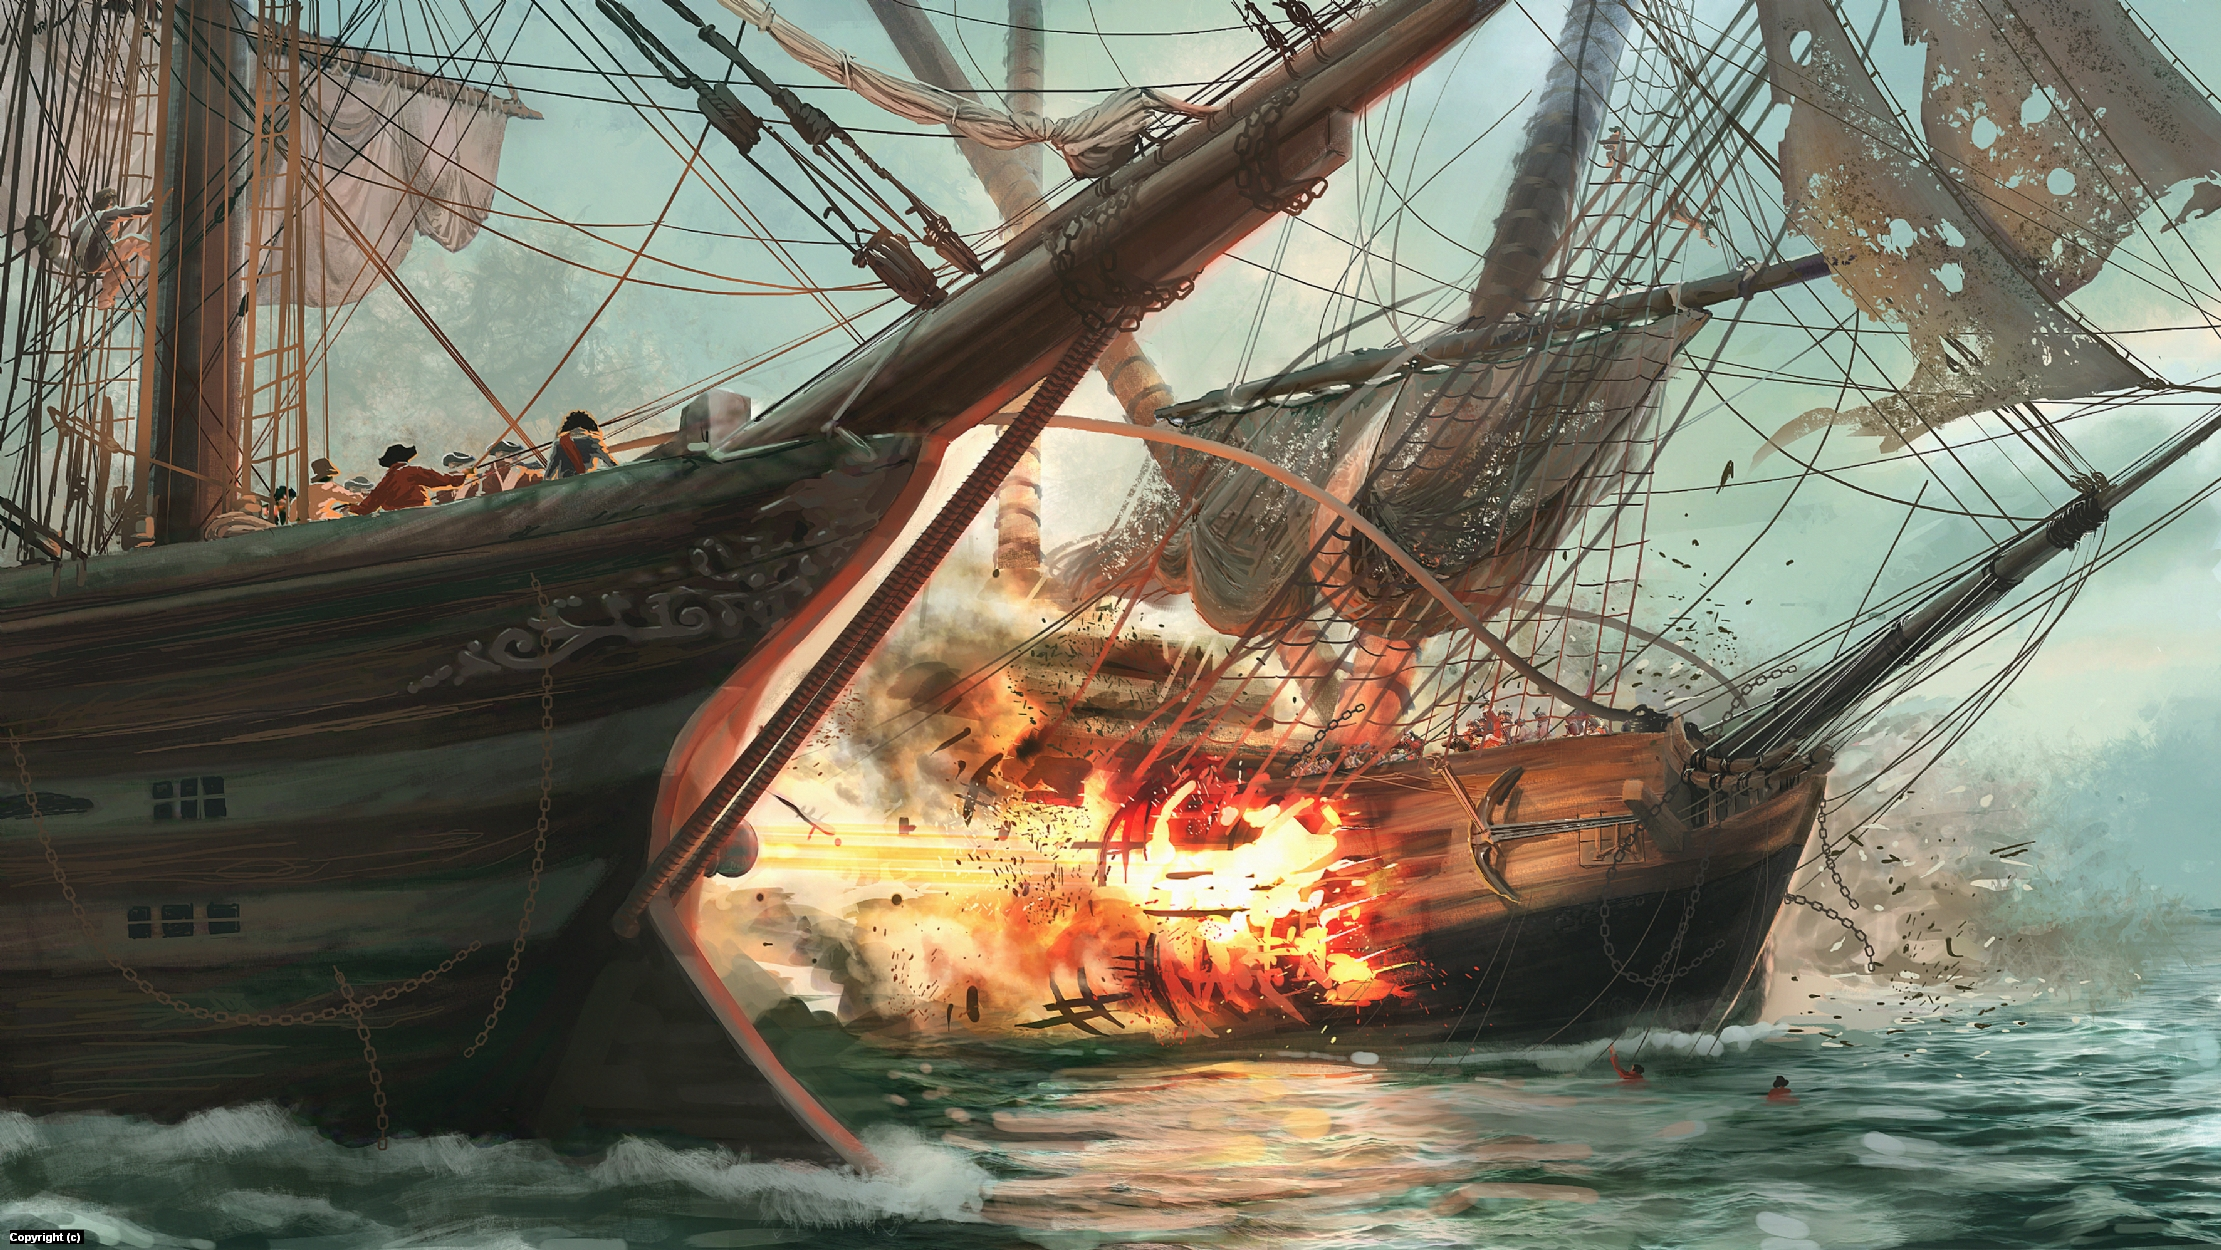 Ship Battle Artwork by Quentin Castel